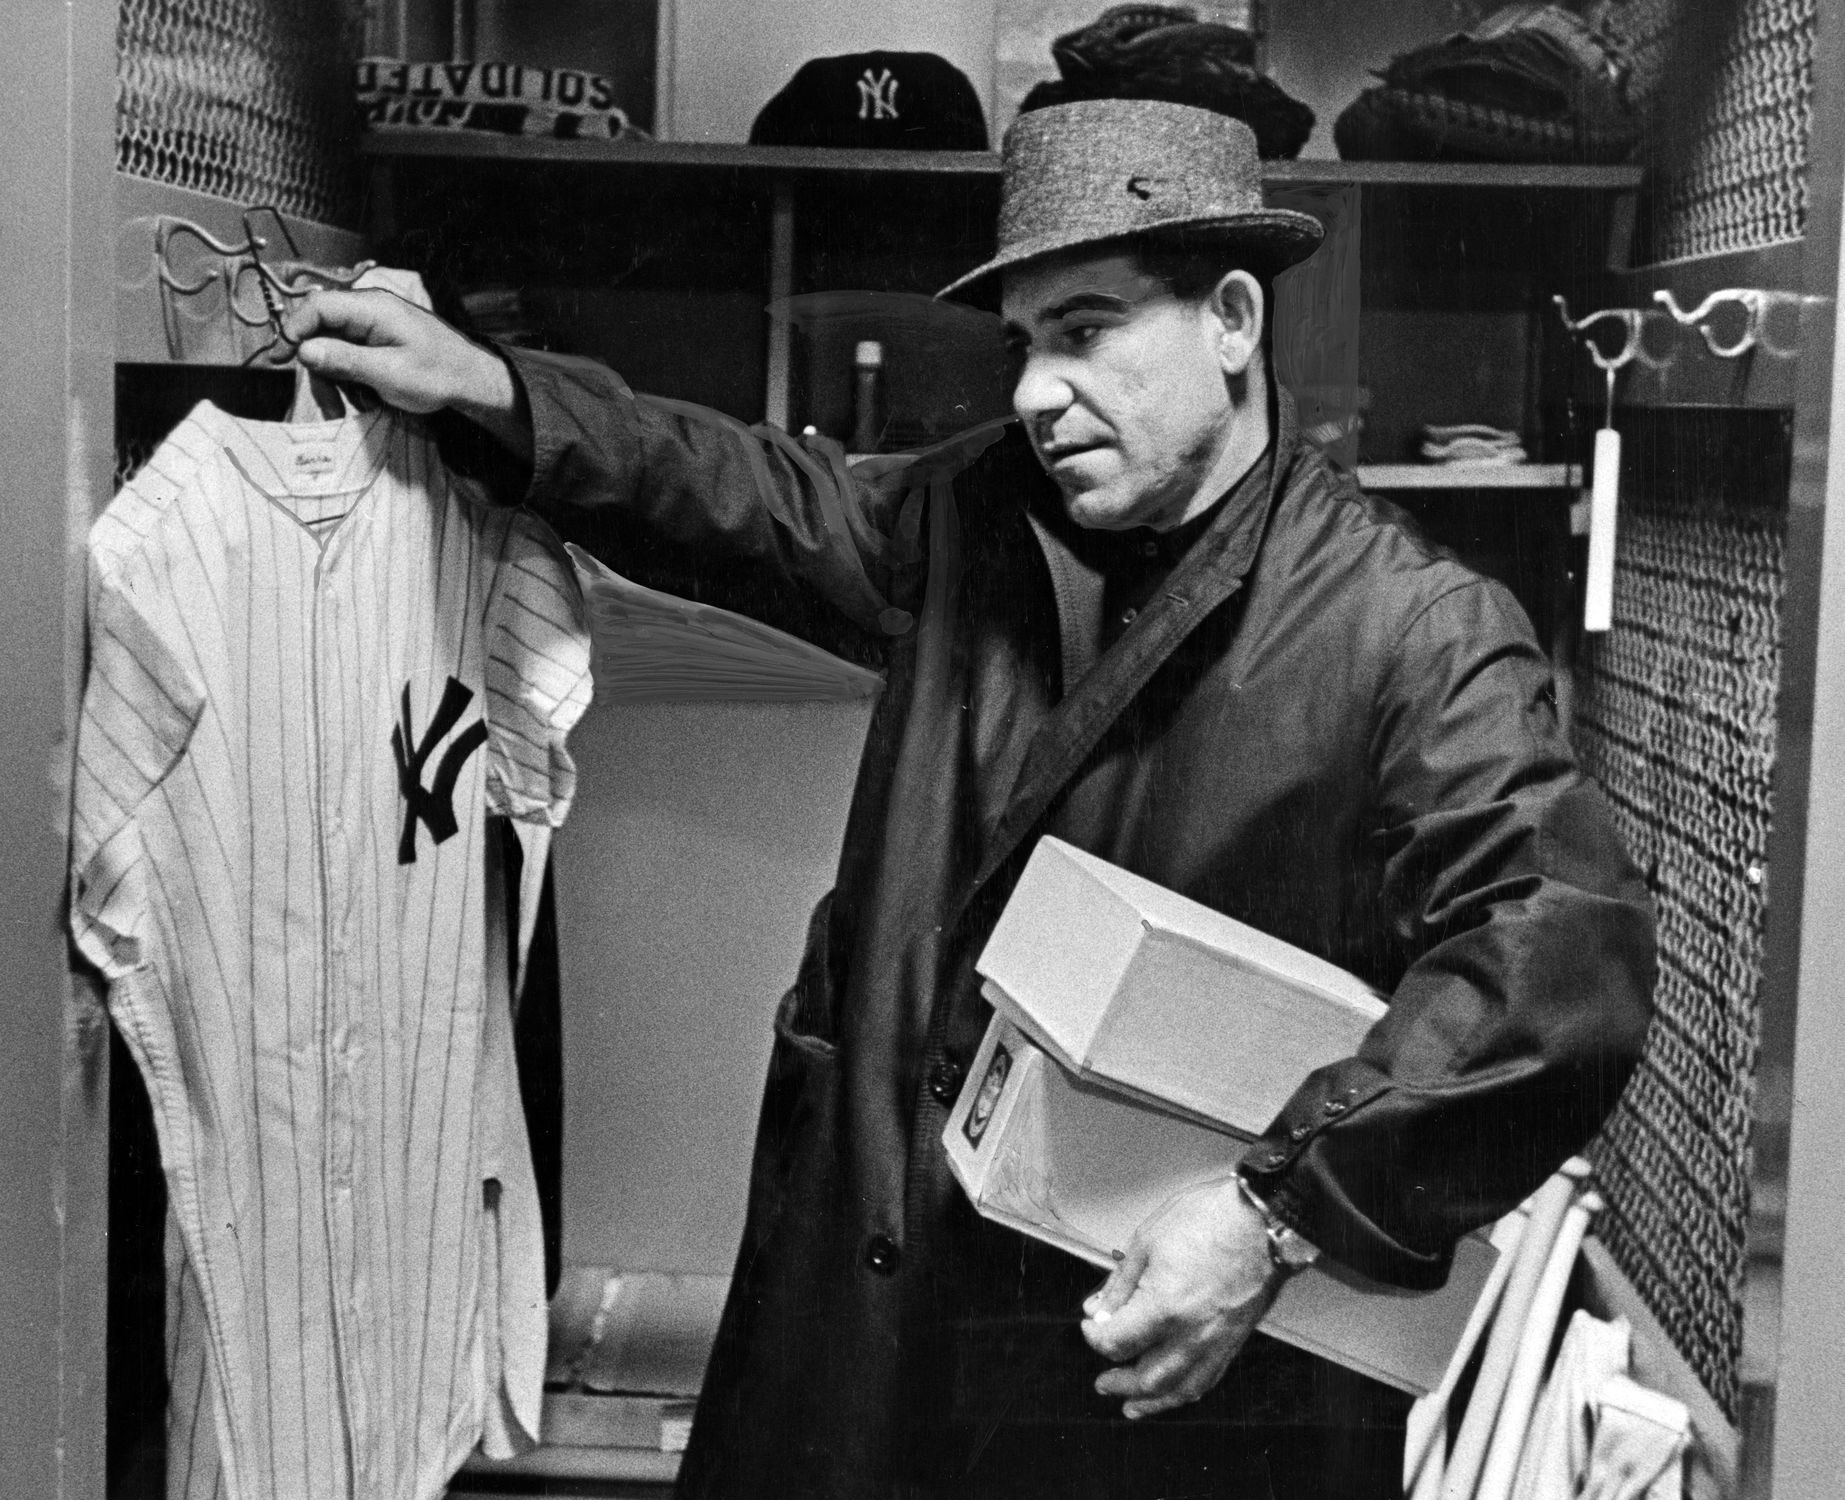 Berra Yogi Baseball Hall Of Fame